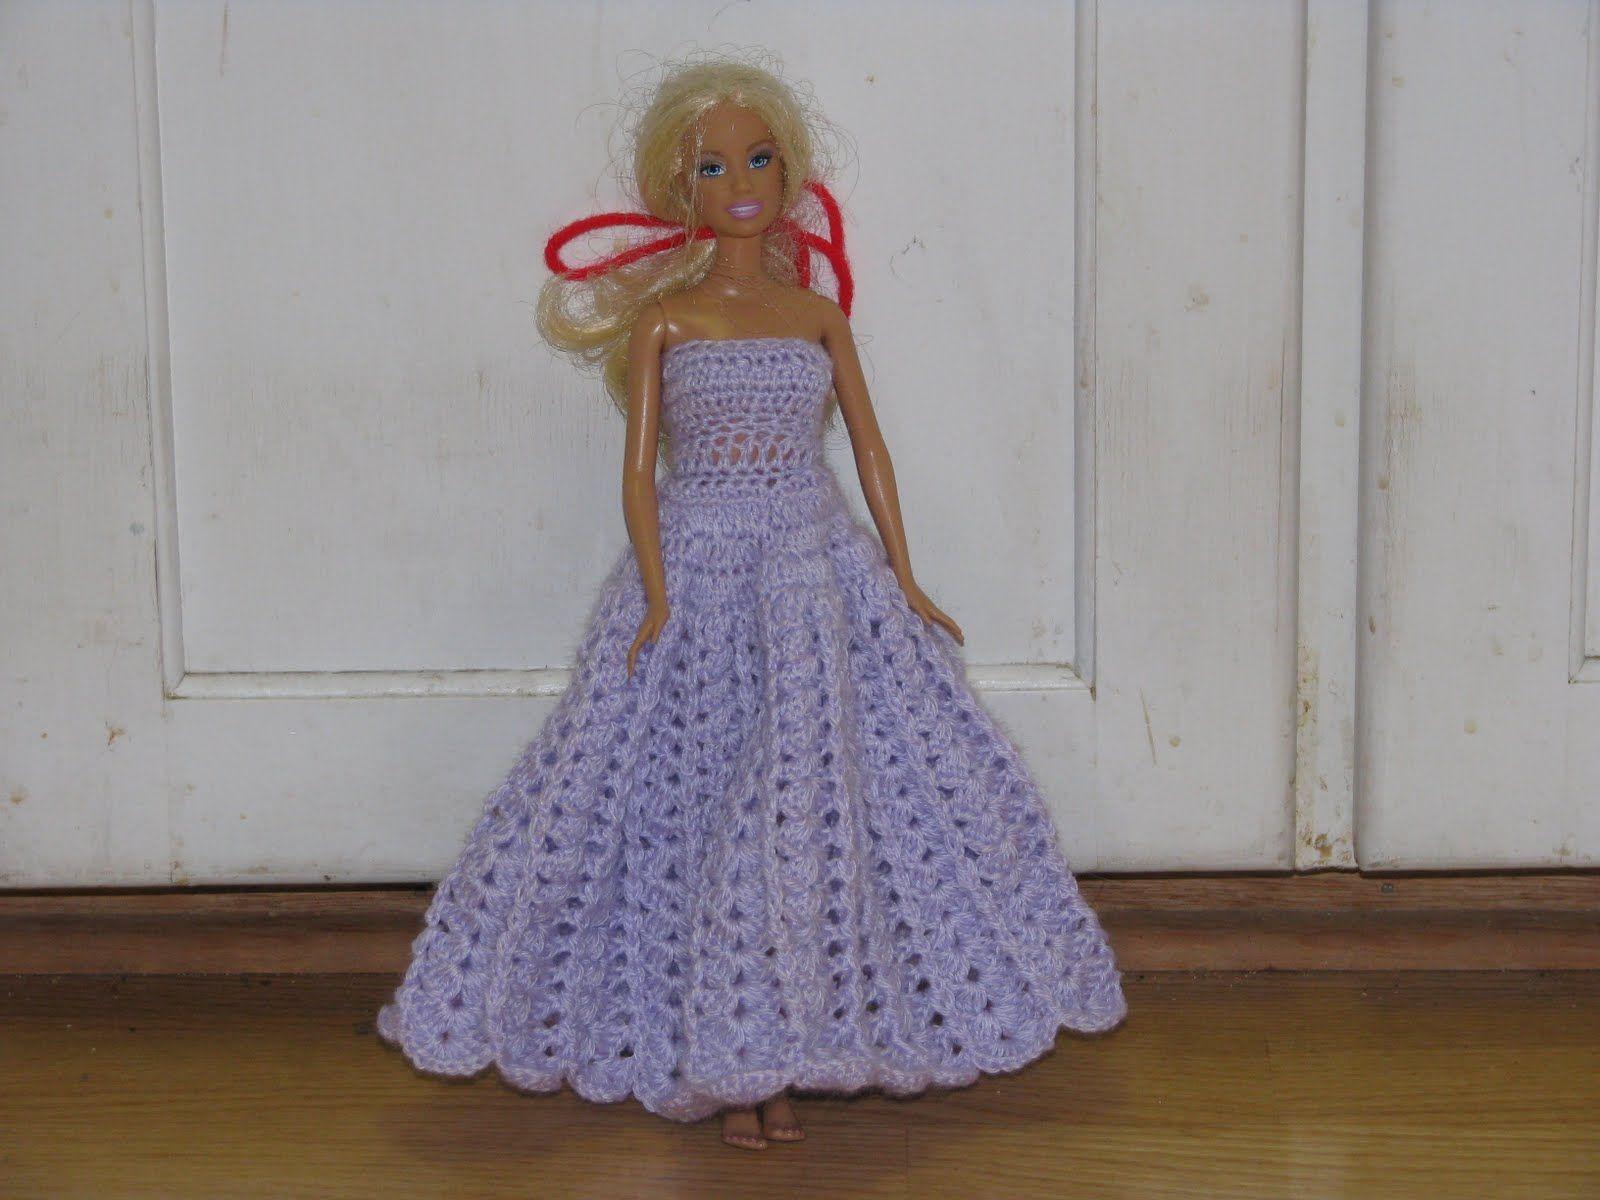 Crochet barbie gowns bing images barbie clothes pinterest crochet barbie gowns bing images bankloansurffo Choice Image